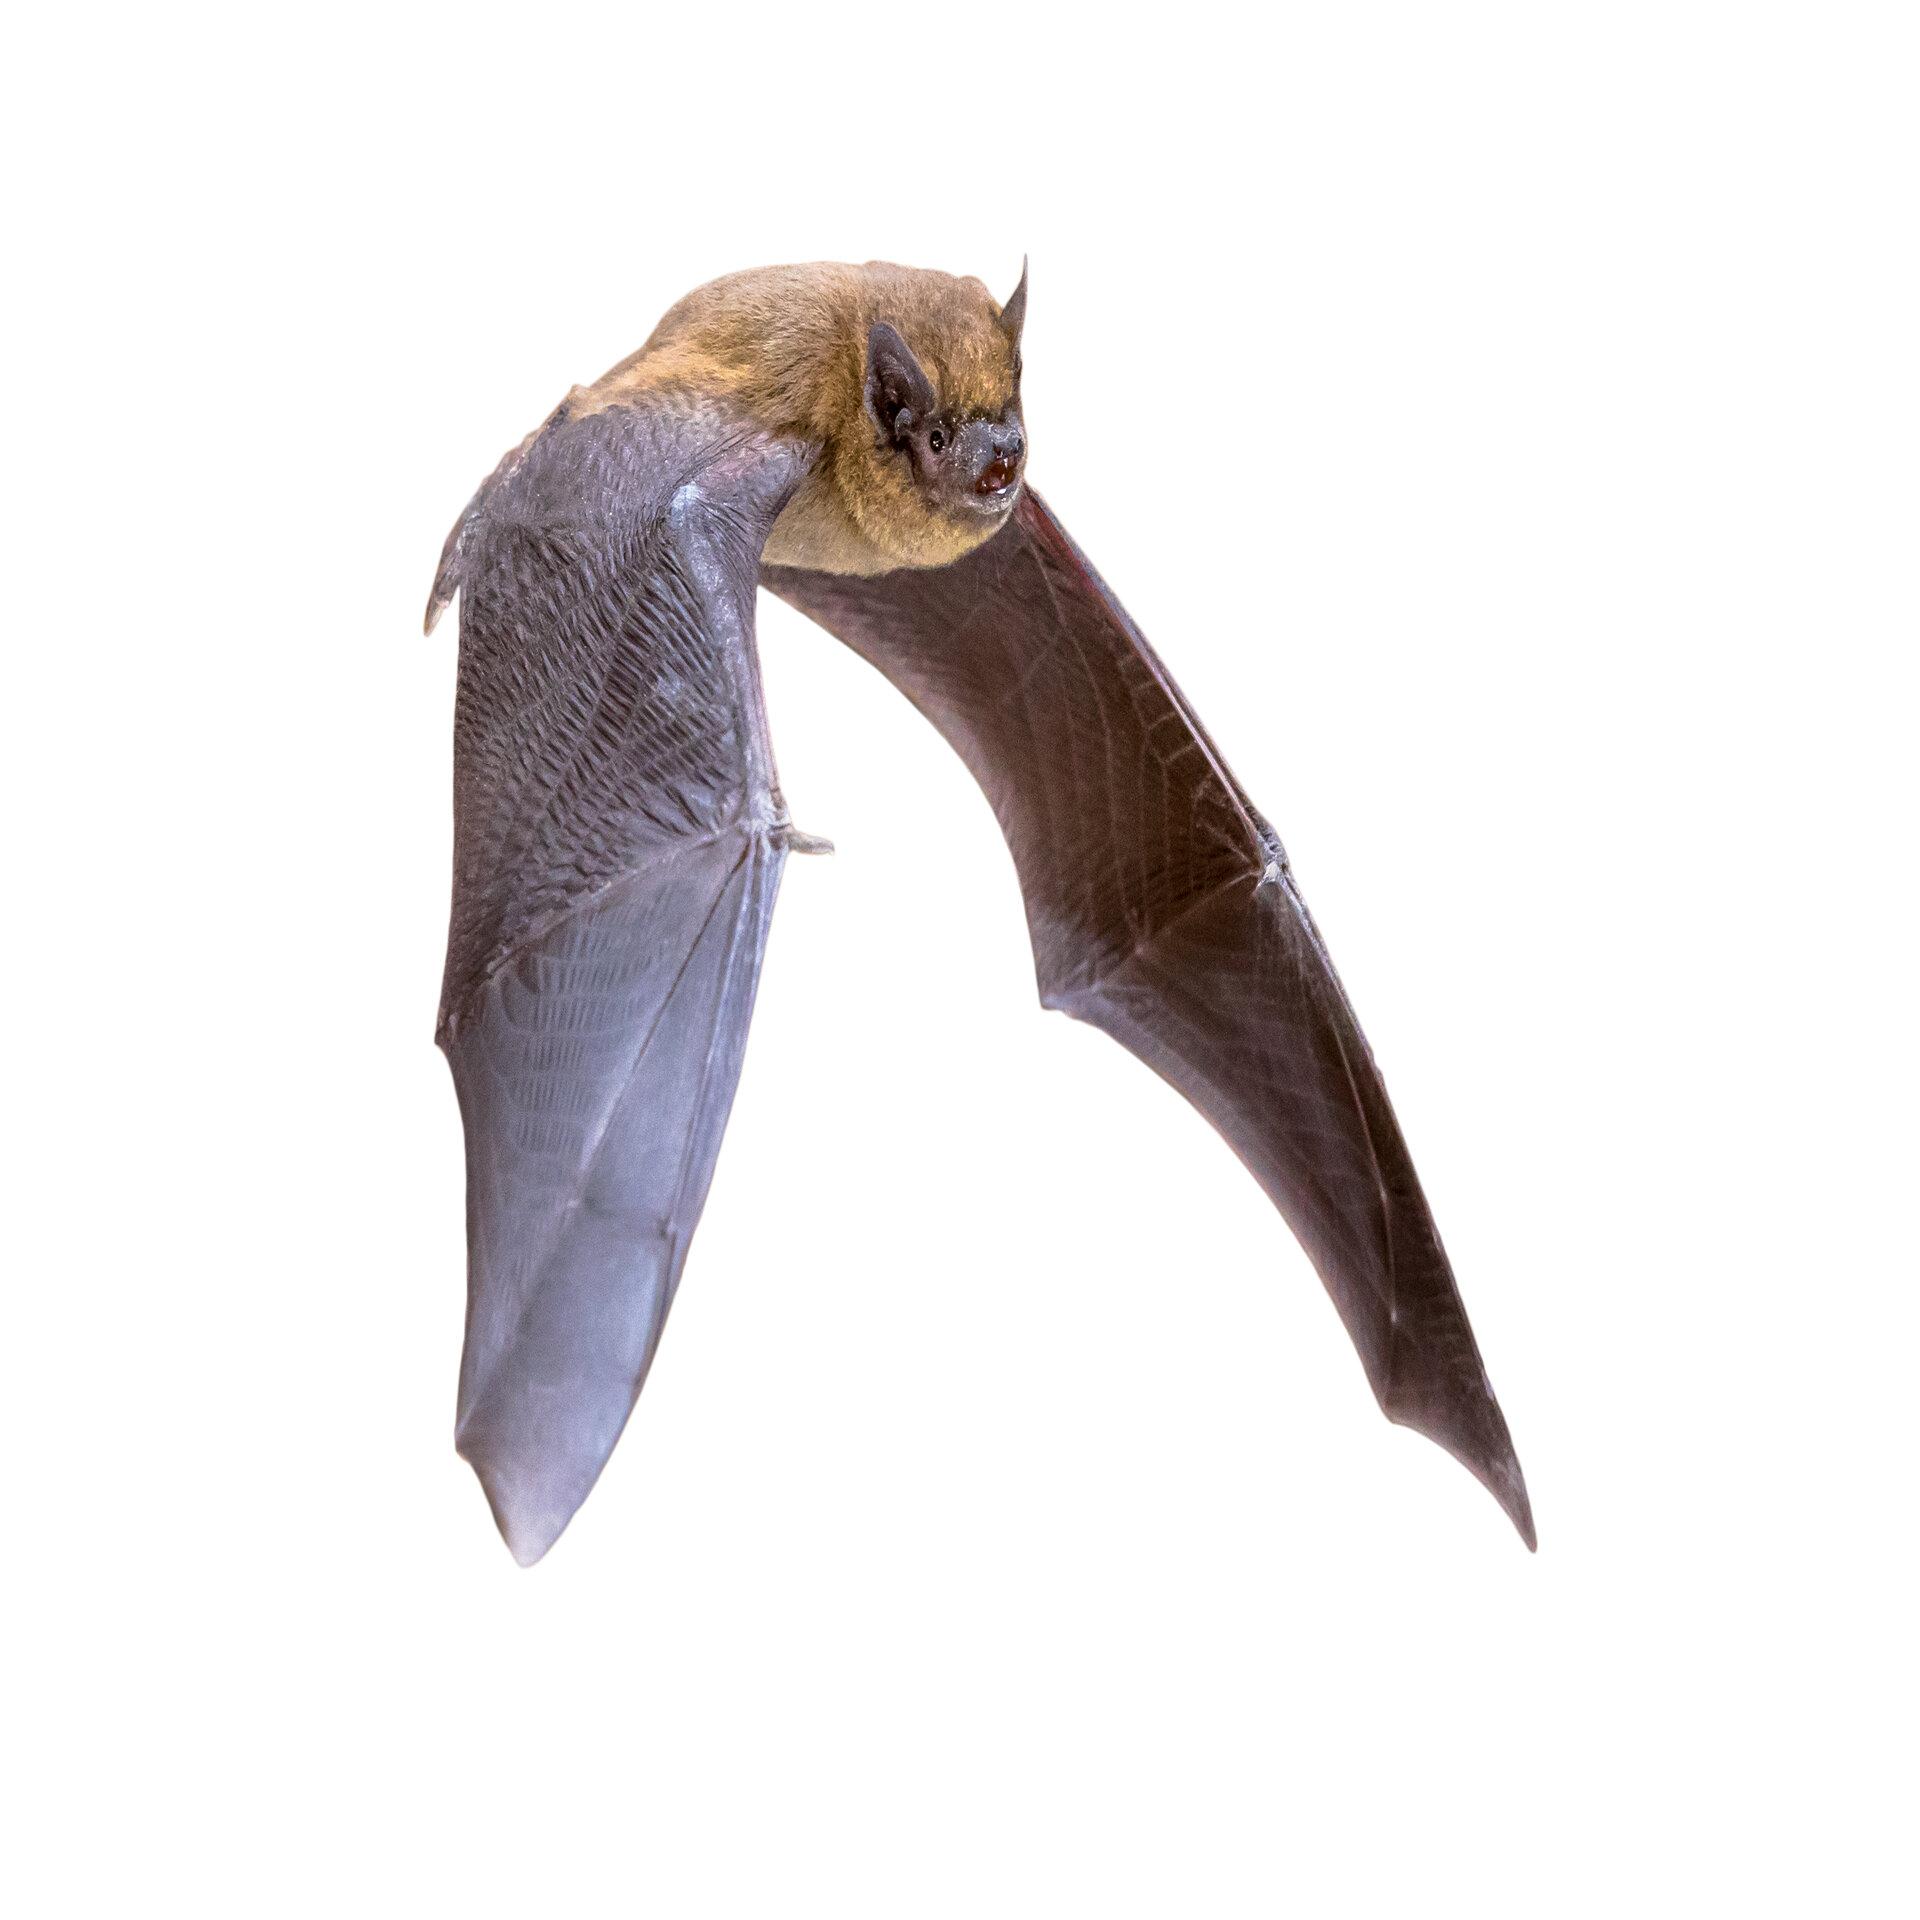 Bat white background